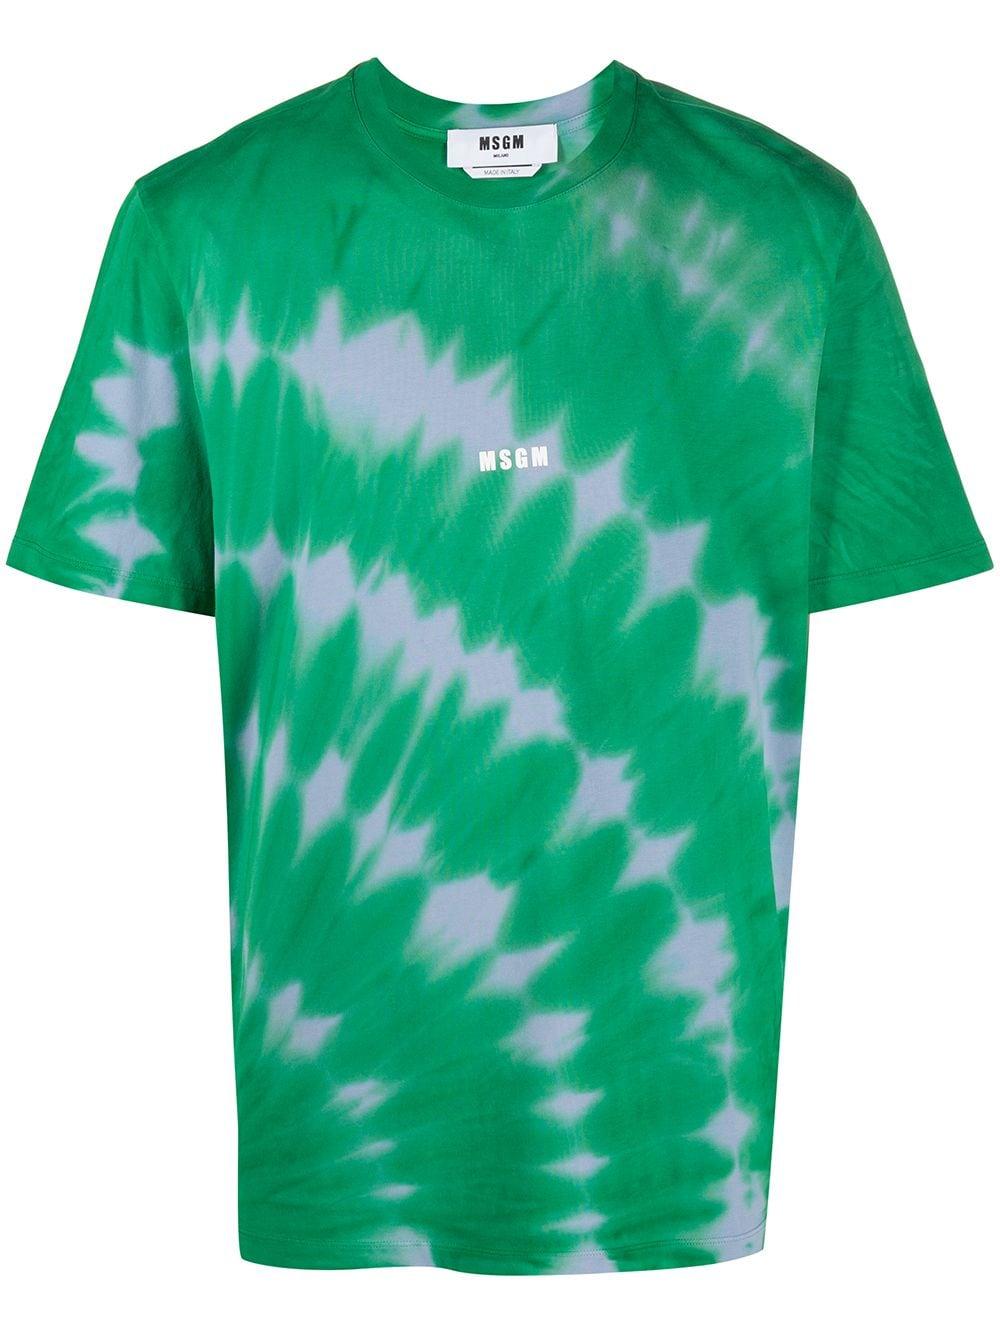 LOGO T-SHIRT MSGM | T-shirts | 3040MM183 21709436